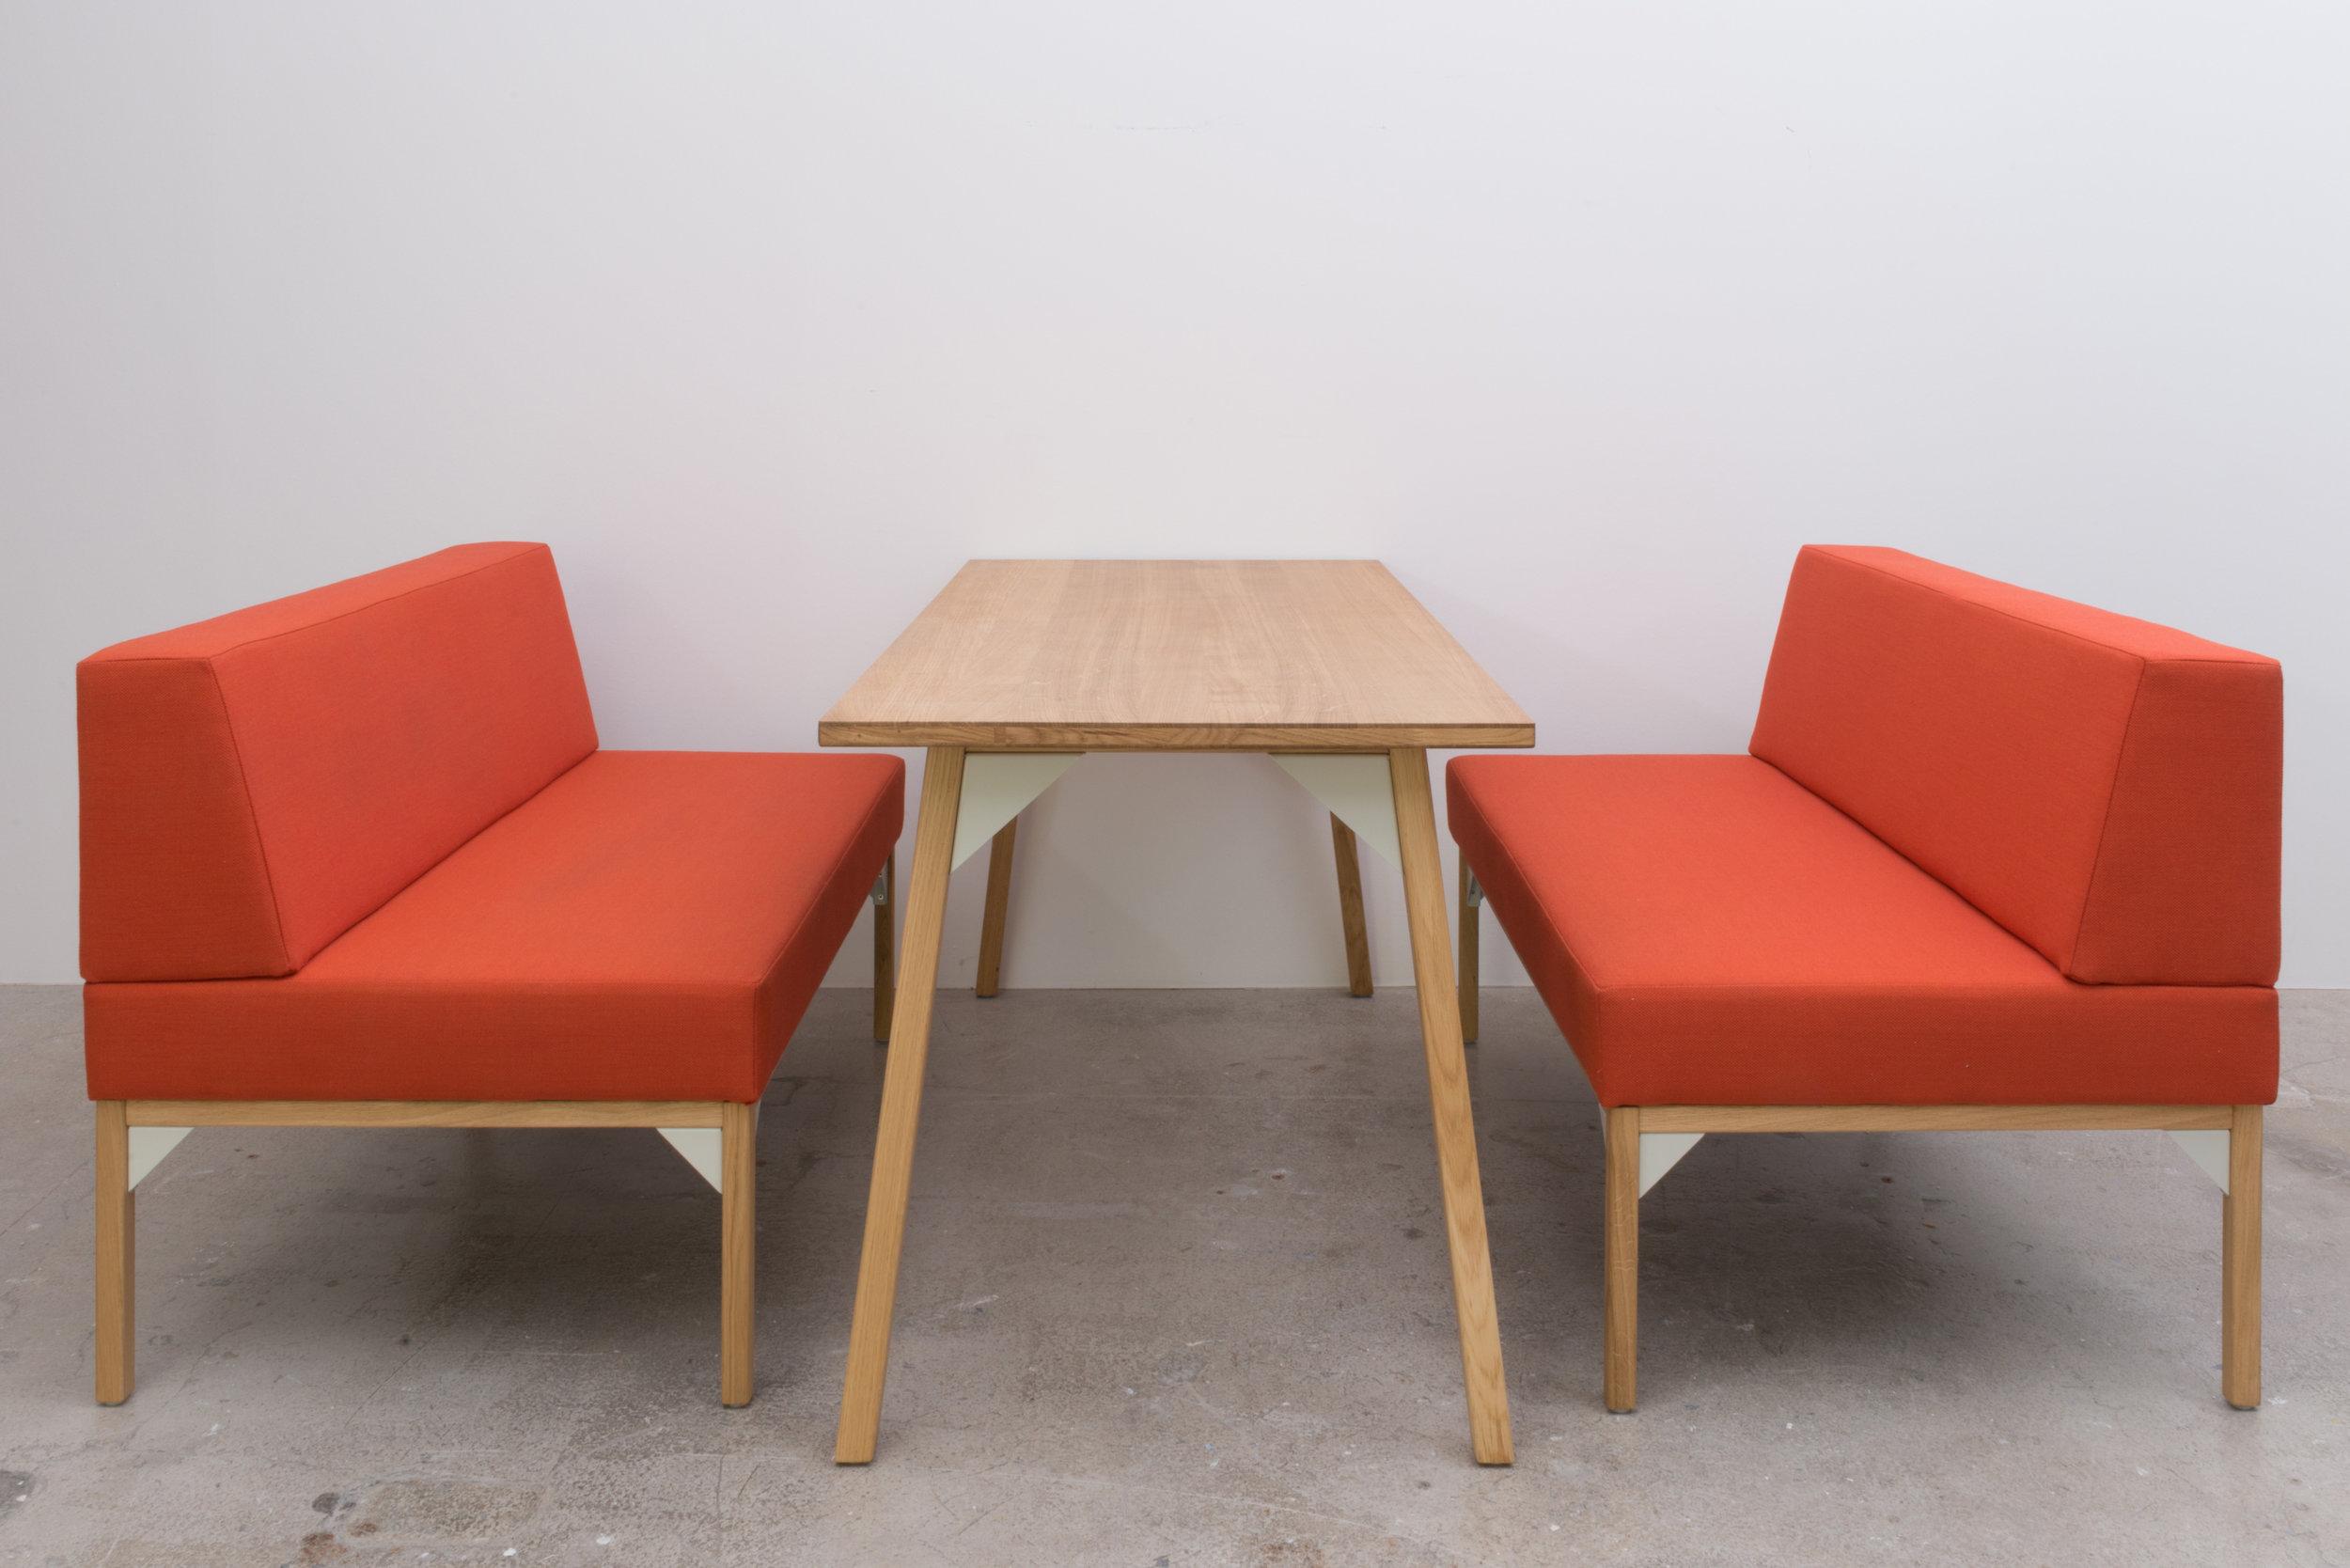 Banquette Seat 1200 x 680 x 800H. Table 1550 x 700 x 740H. Oak & Kvadrat Steelcut